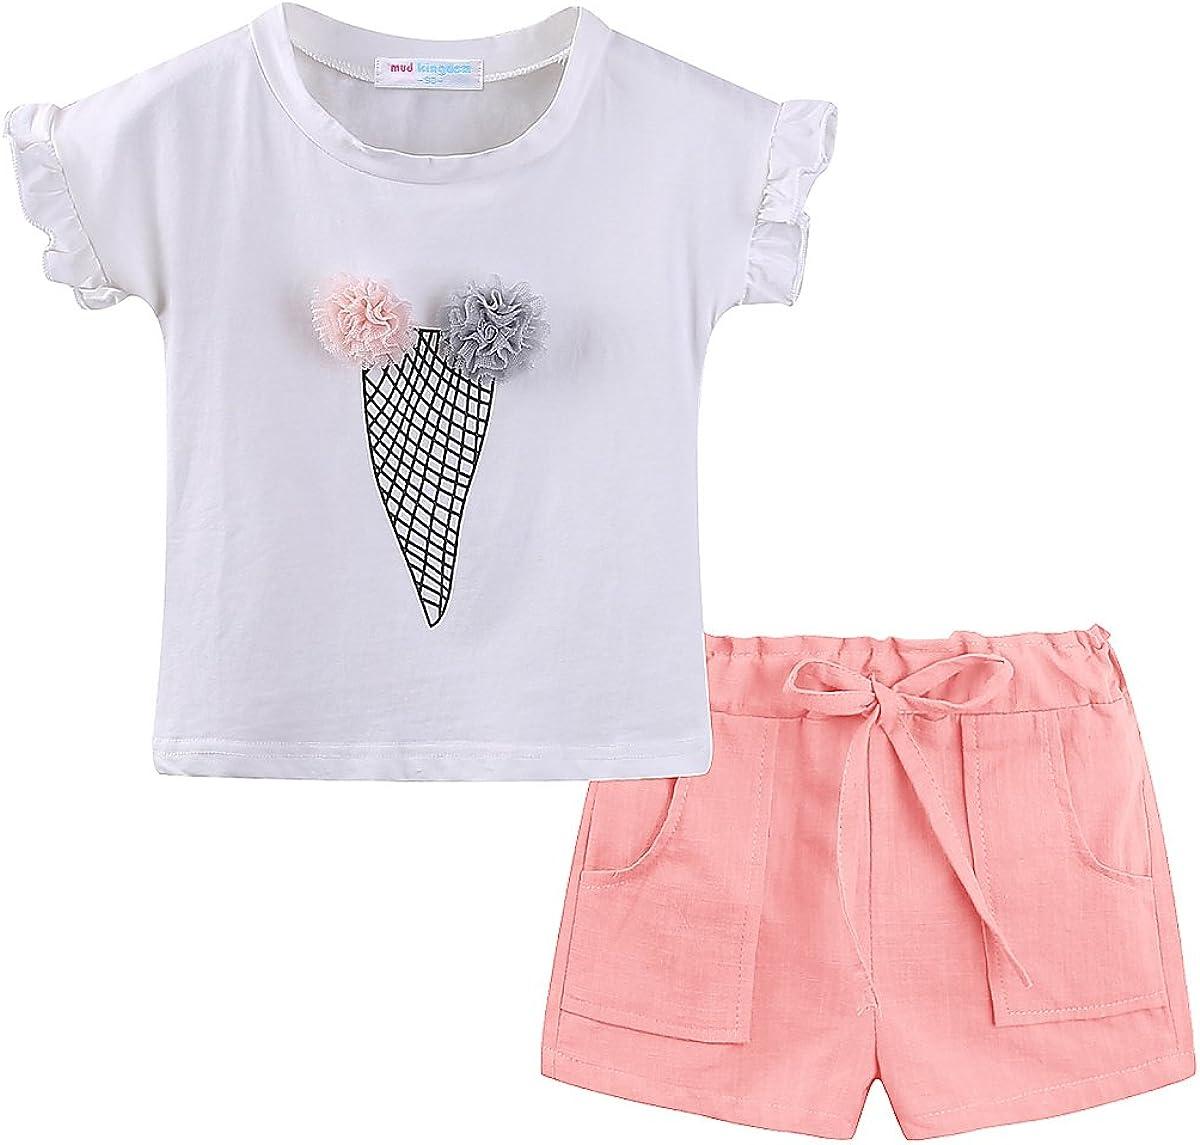 Mud Kingdom Cute Girl Outfits Summer Holiday Fun